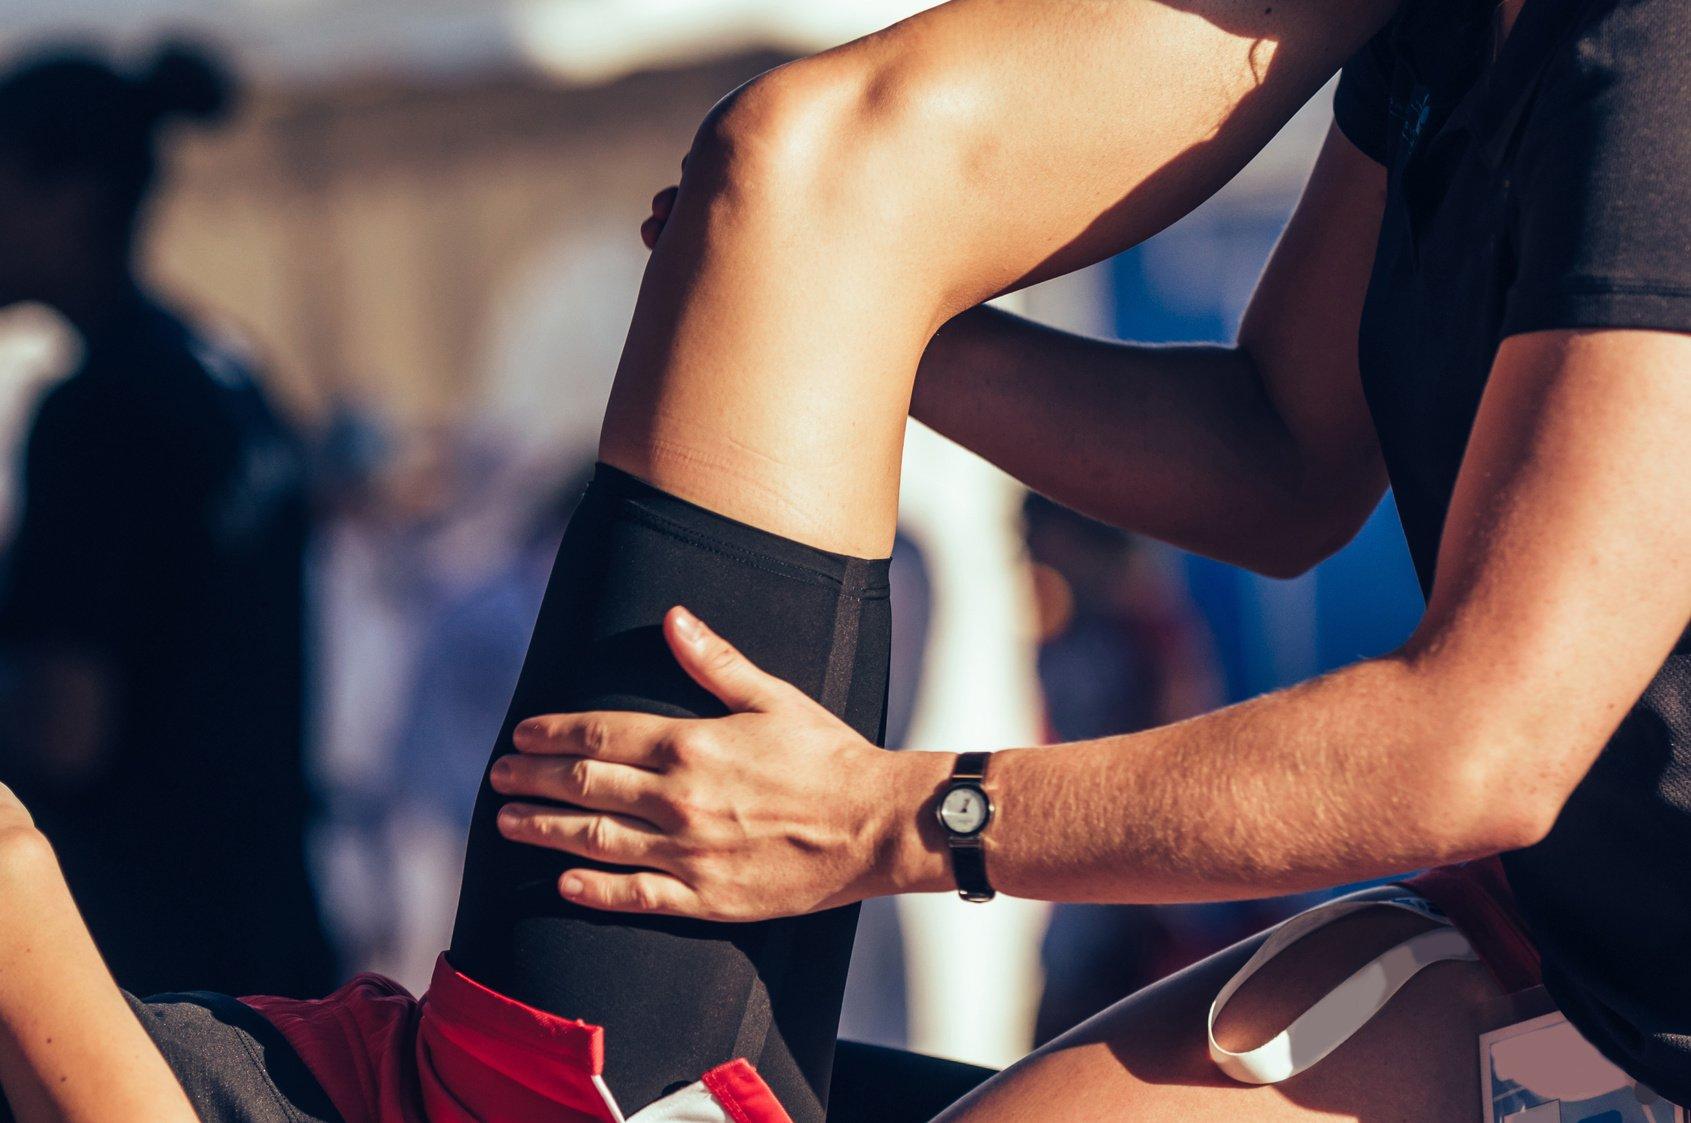 Sport therapist massaging leg of an athlete